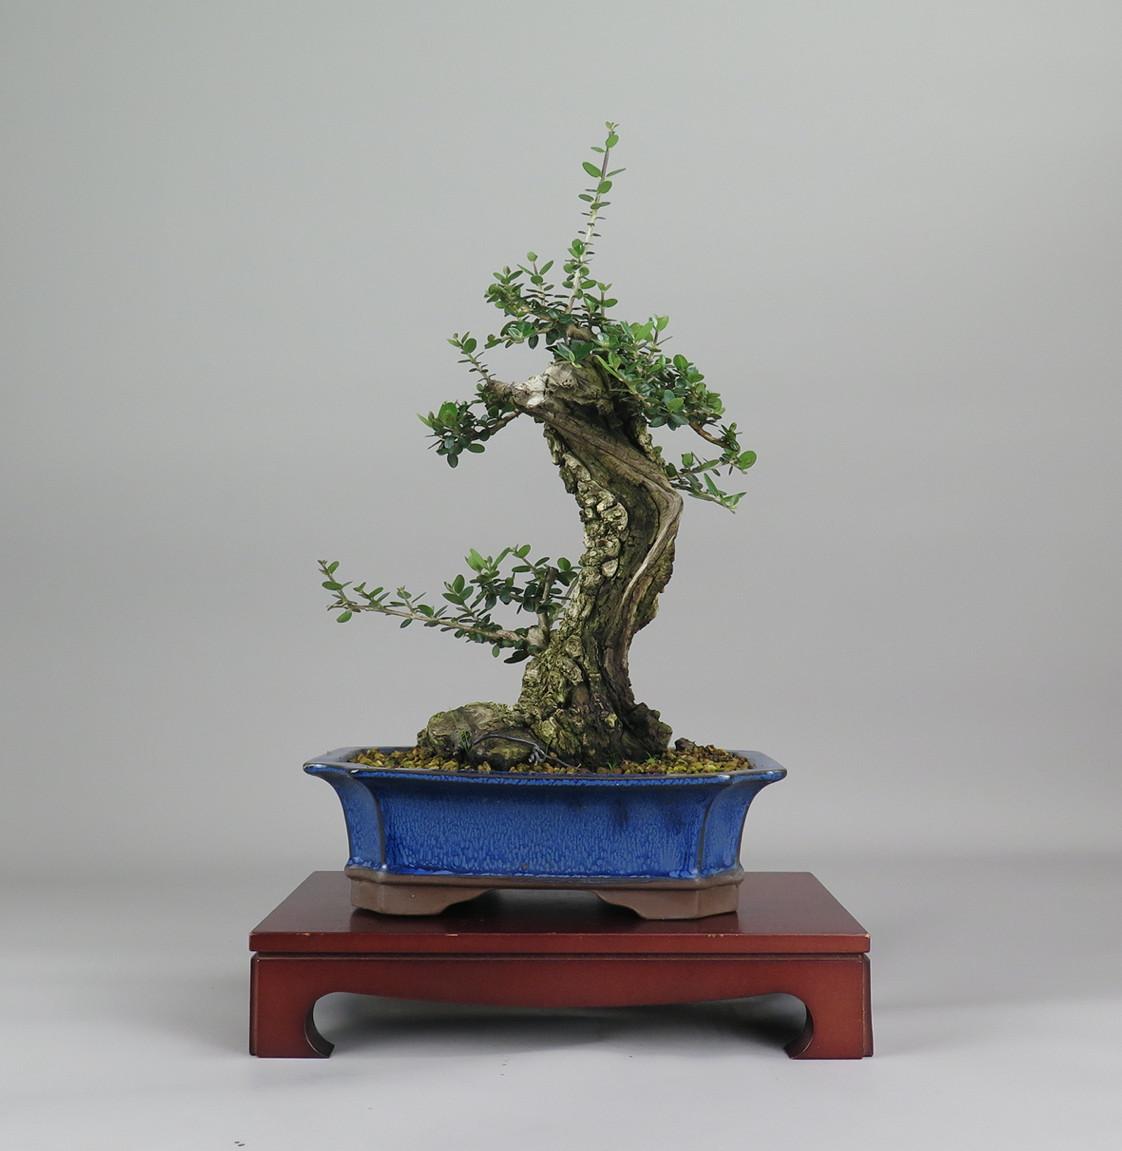 Bonsai de olivo, frente